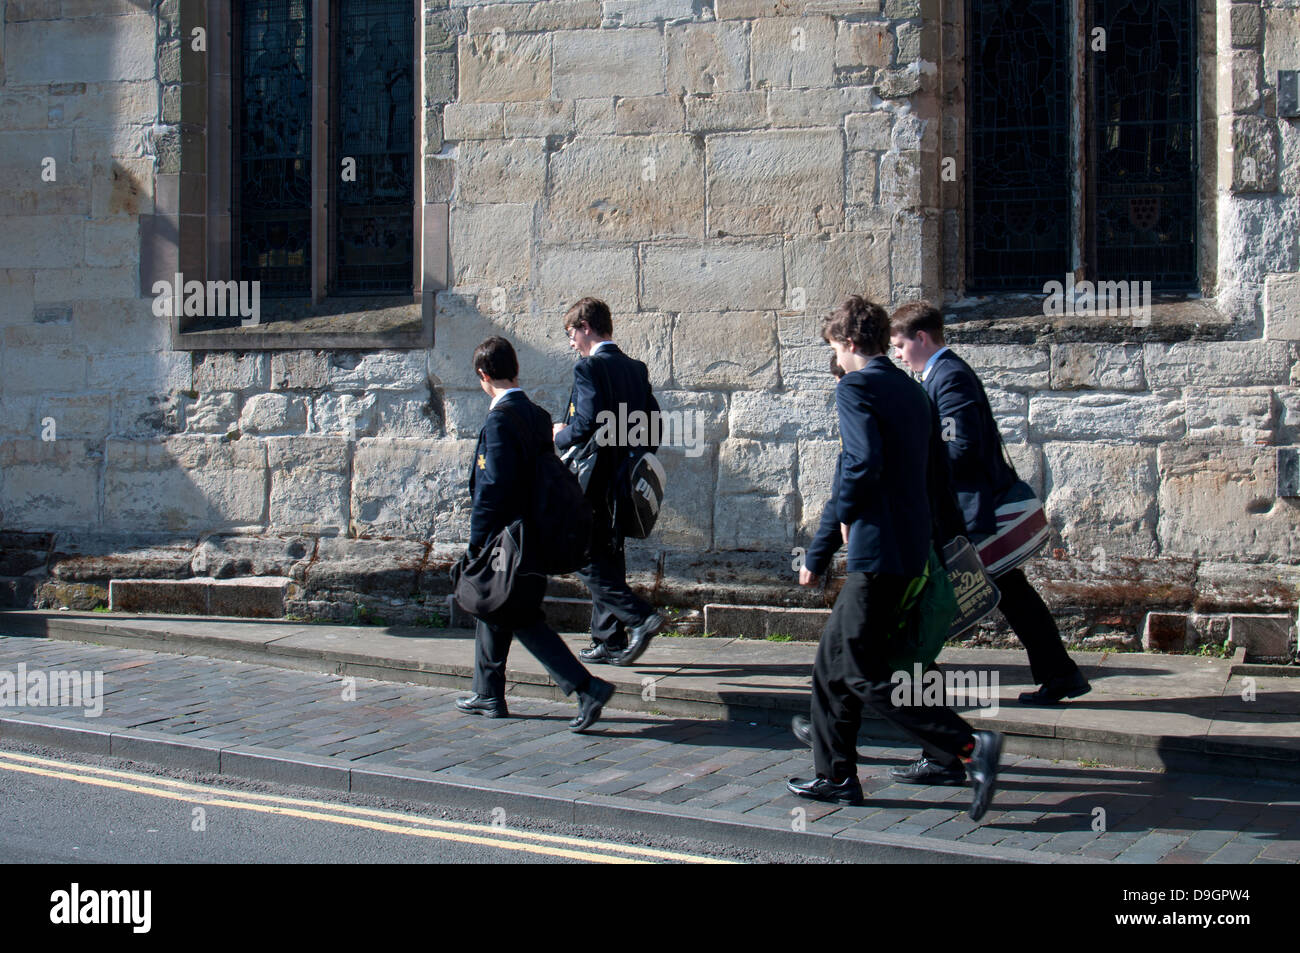 Schoolboys from King Edward VI Grammar School, Stratford-upon-Avon, UK - Stock Image